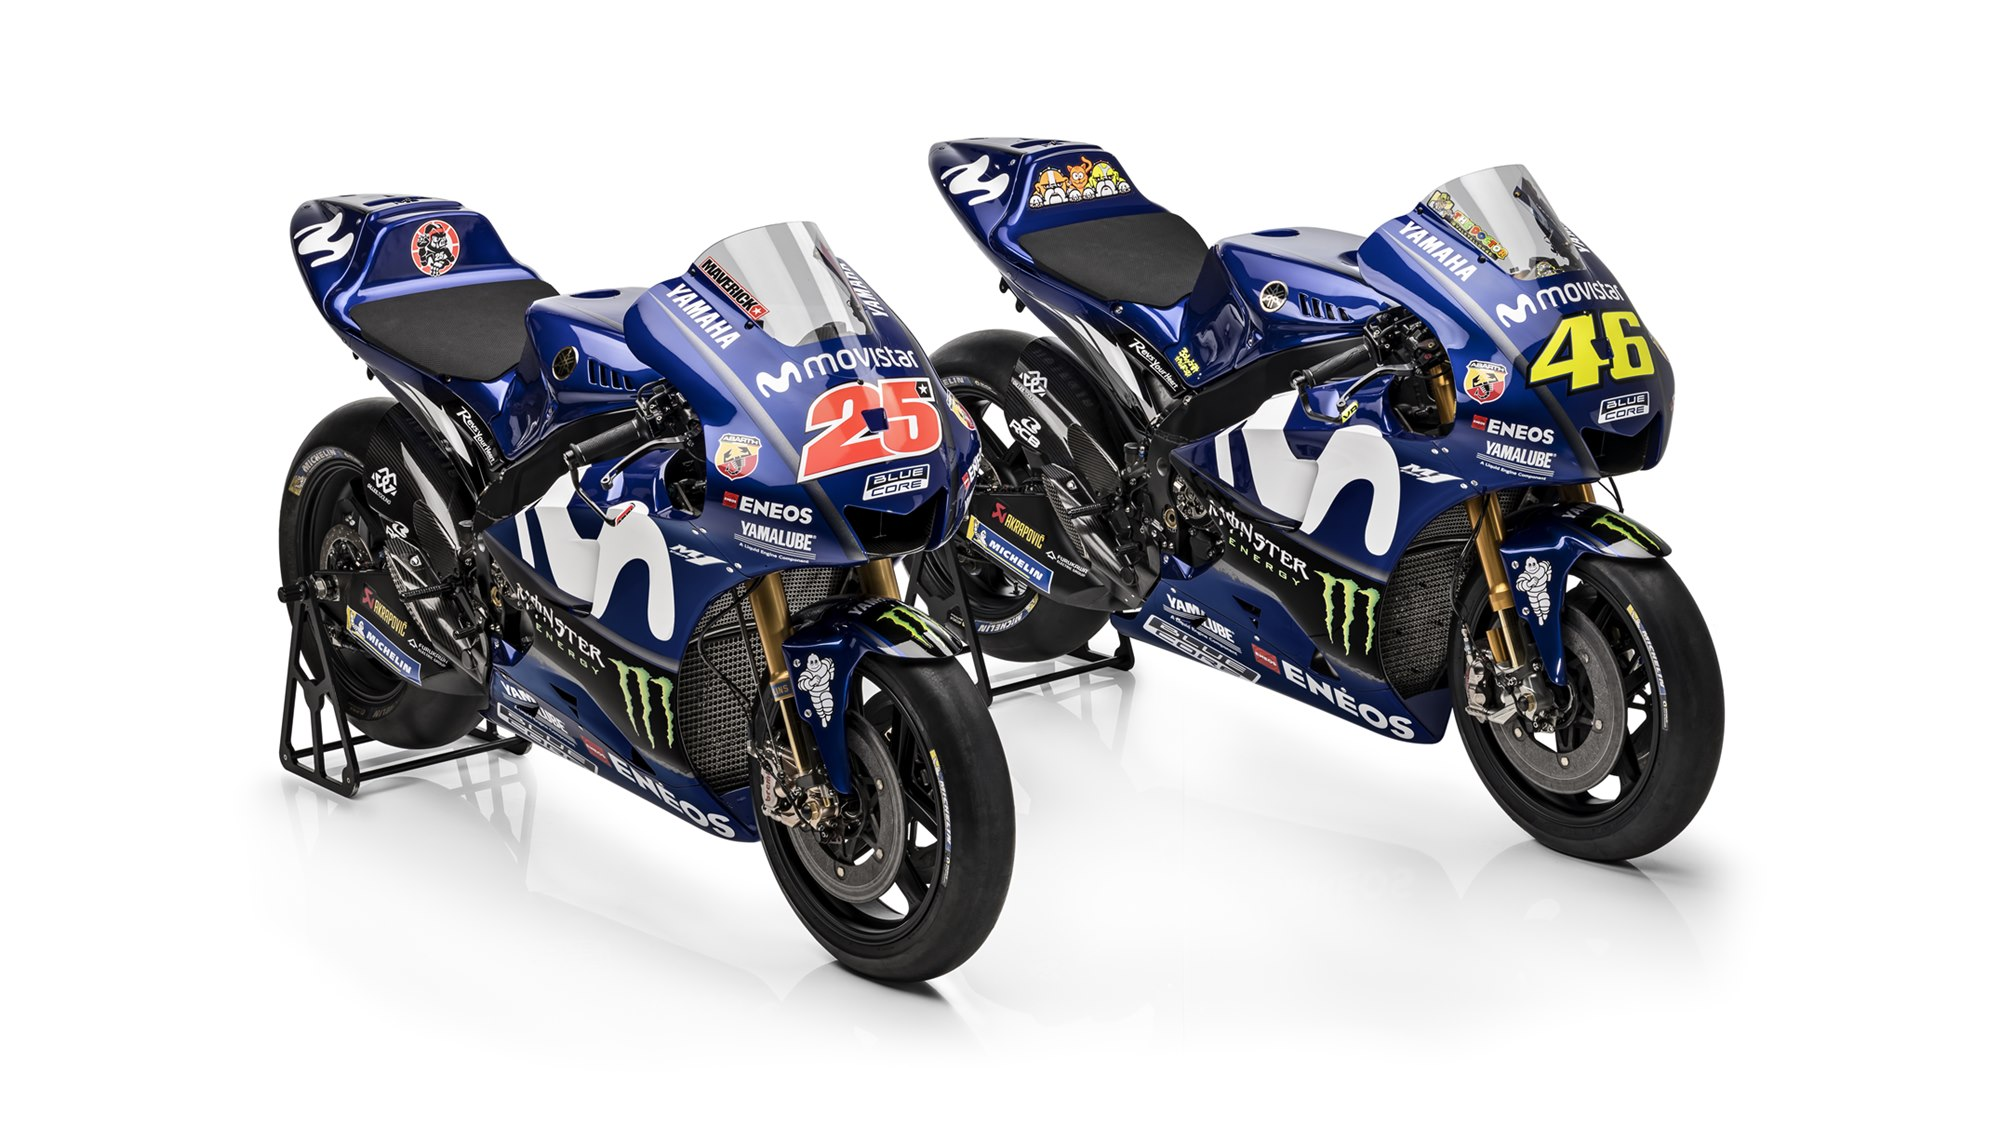 2018 Yamaha MotoGP bikes